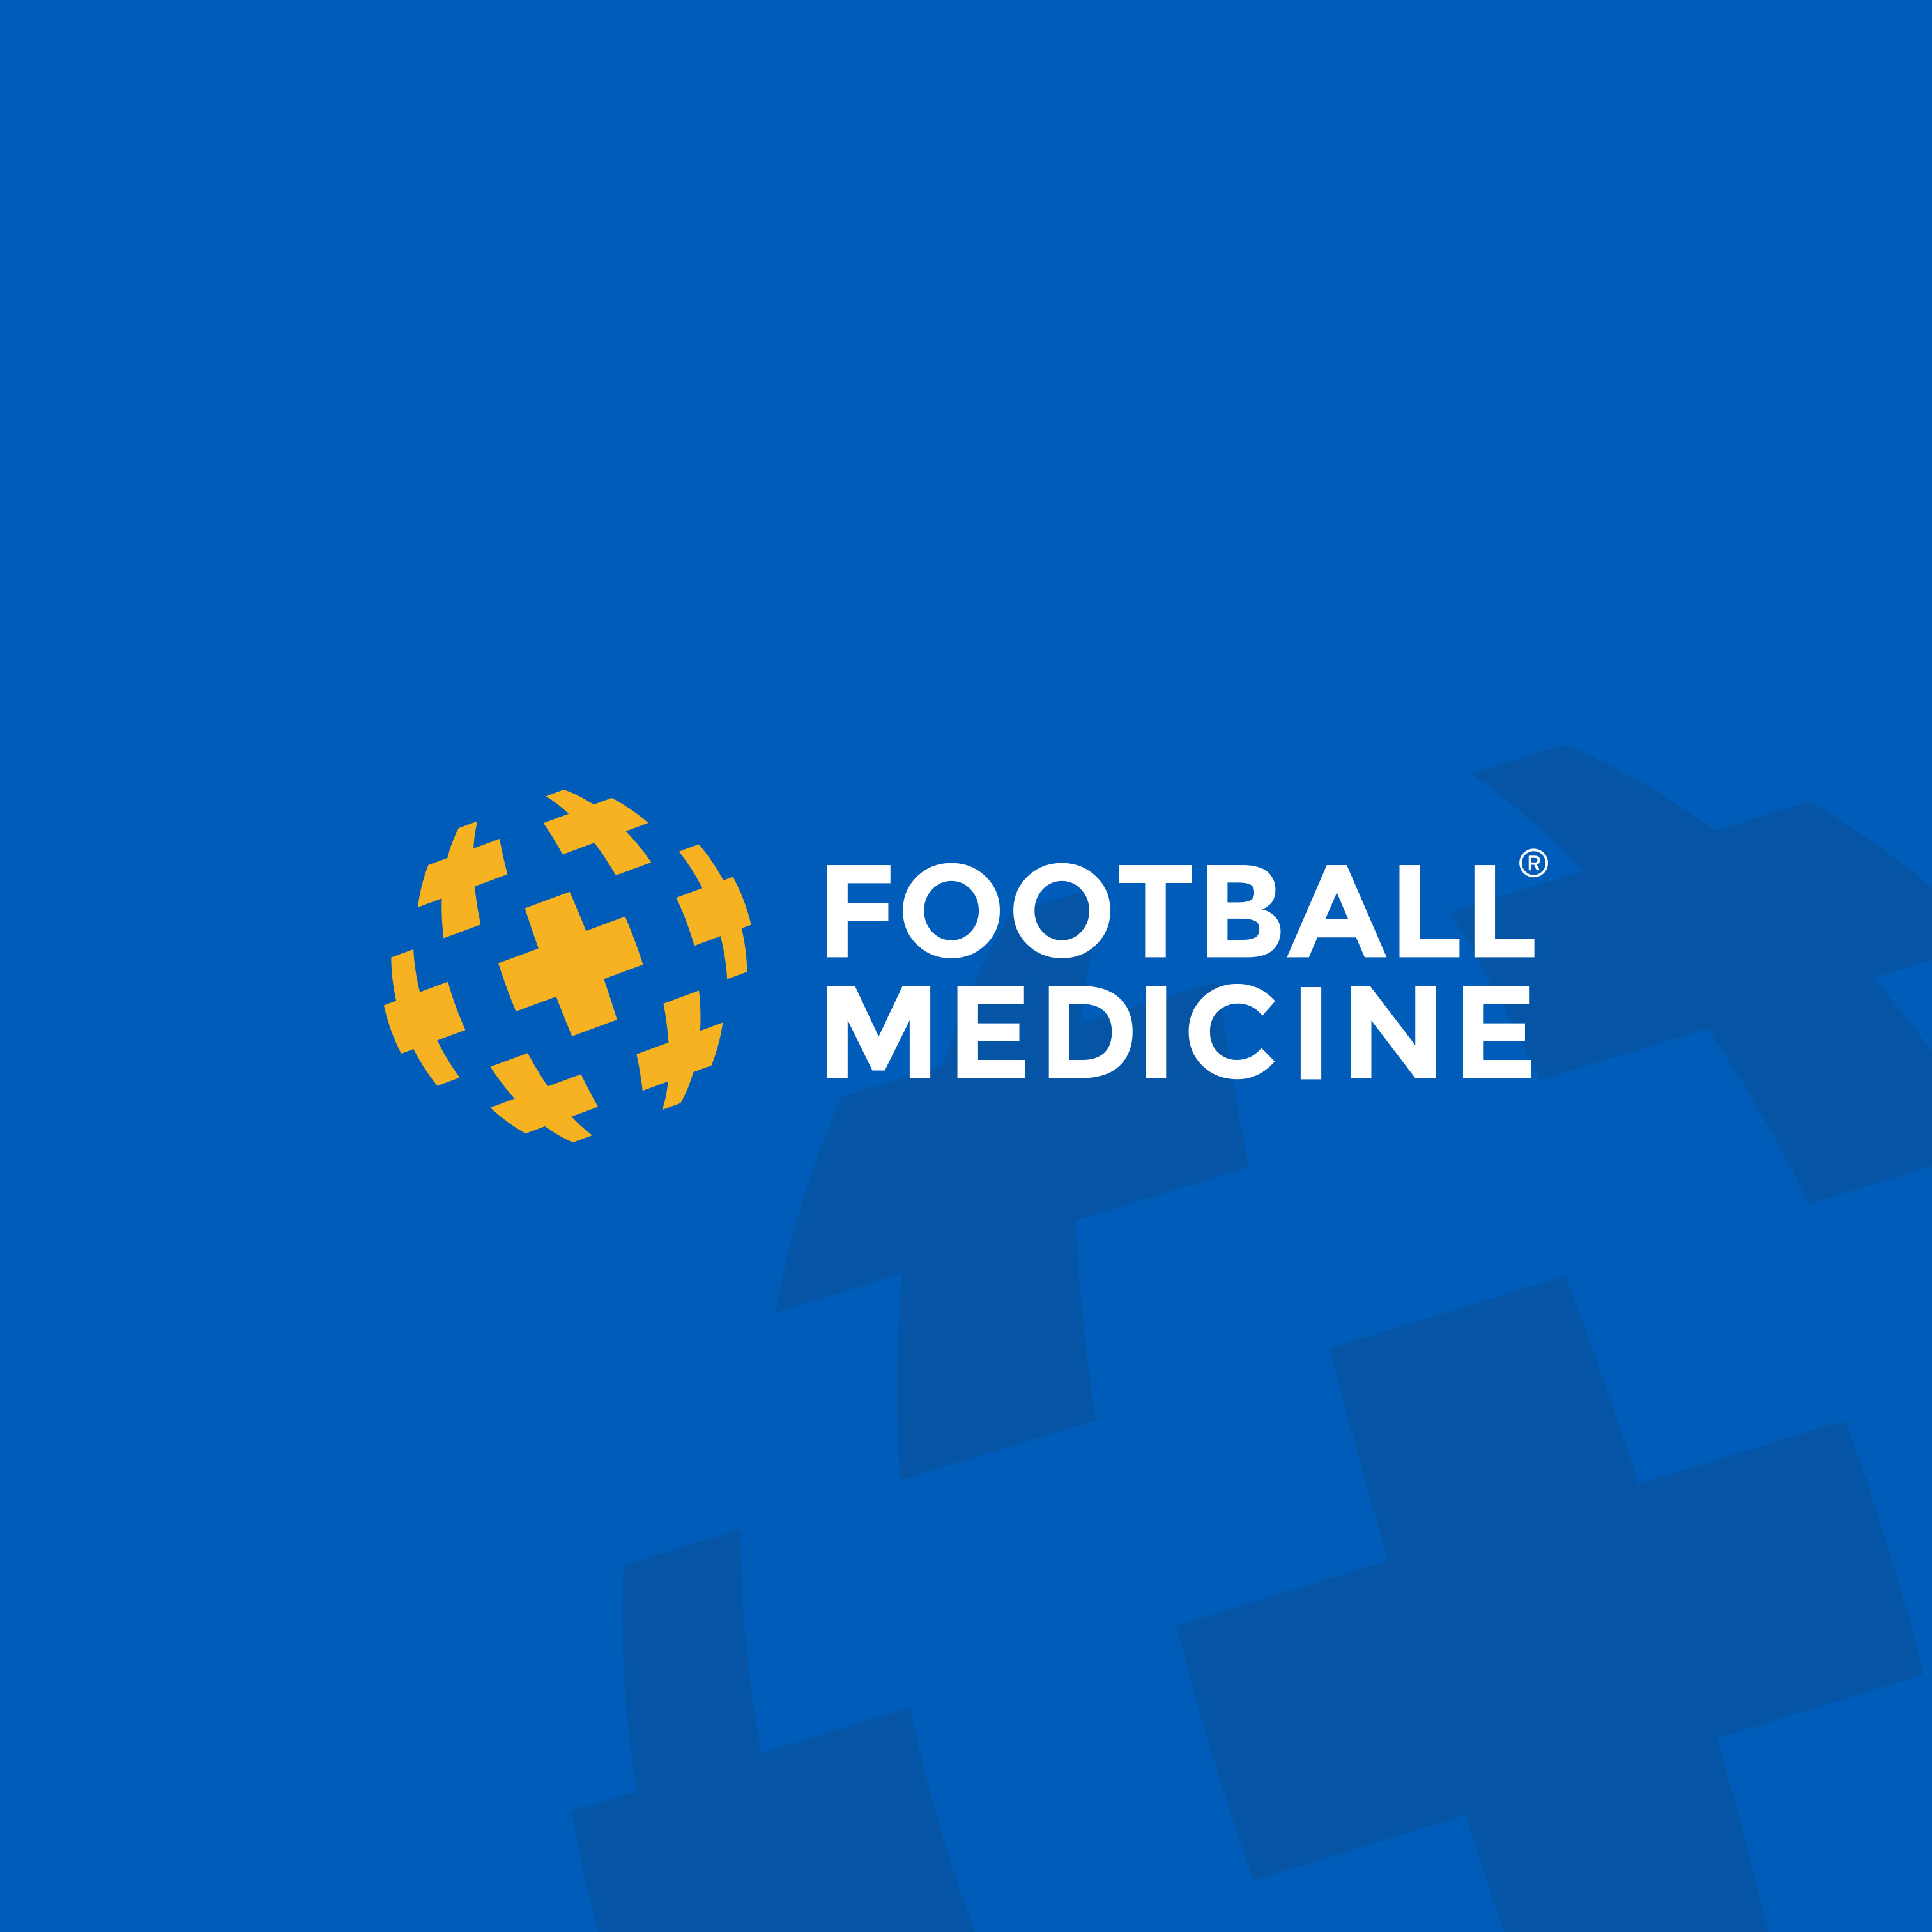 Football Medicine